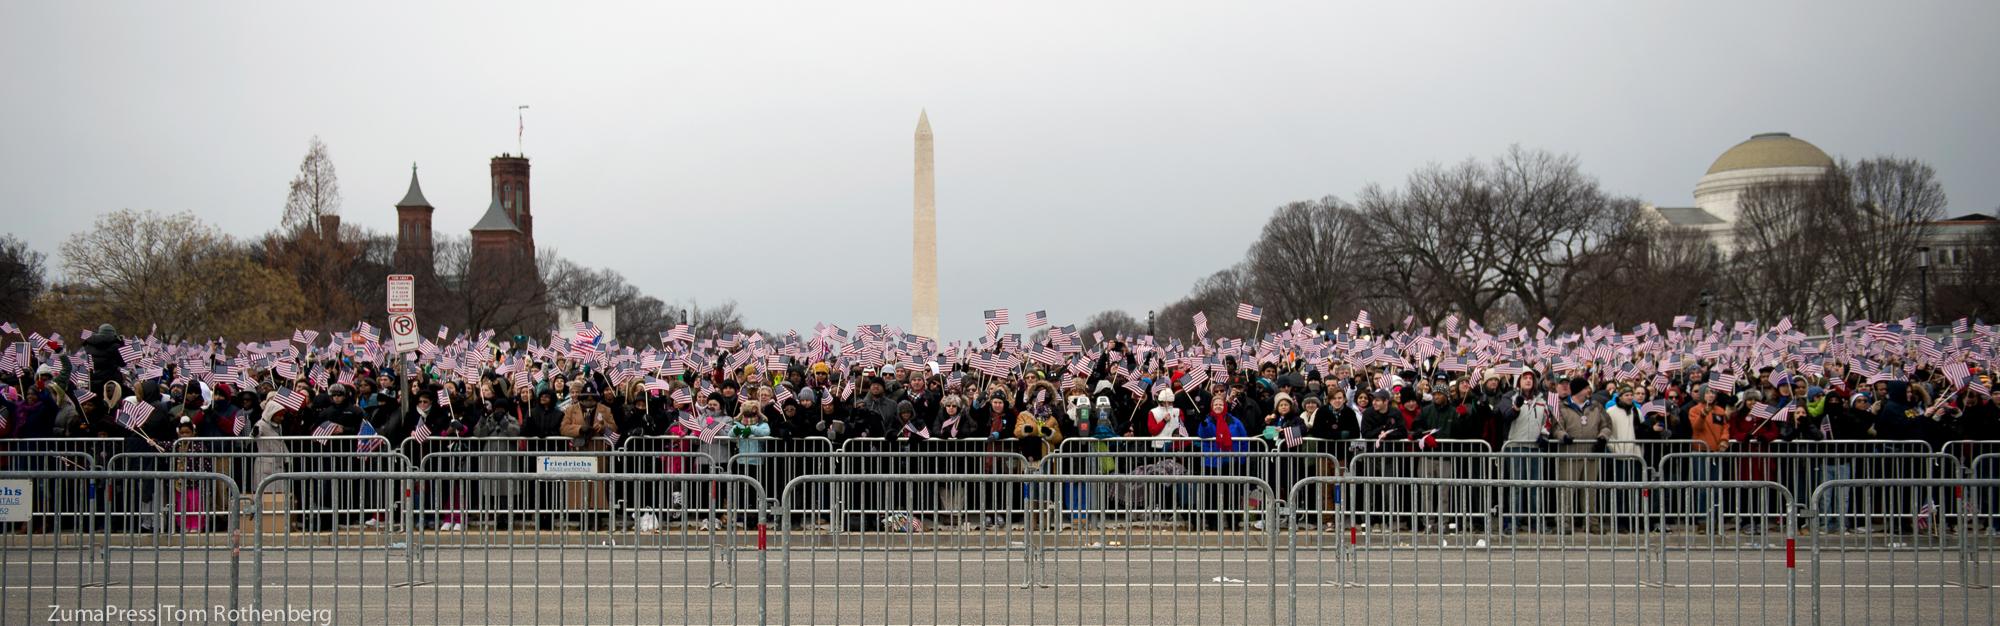 2013_inauguration-17.jpg